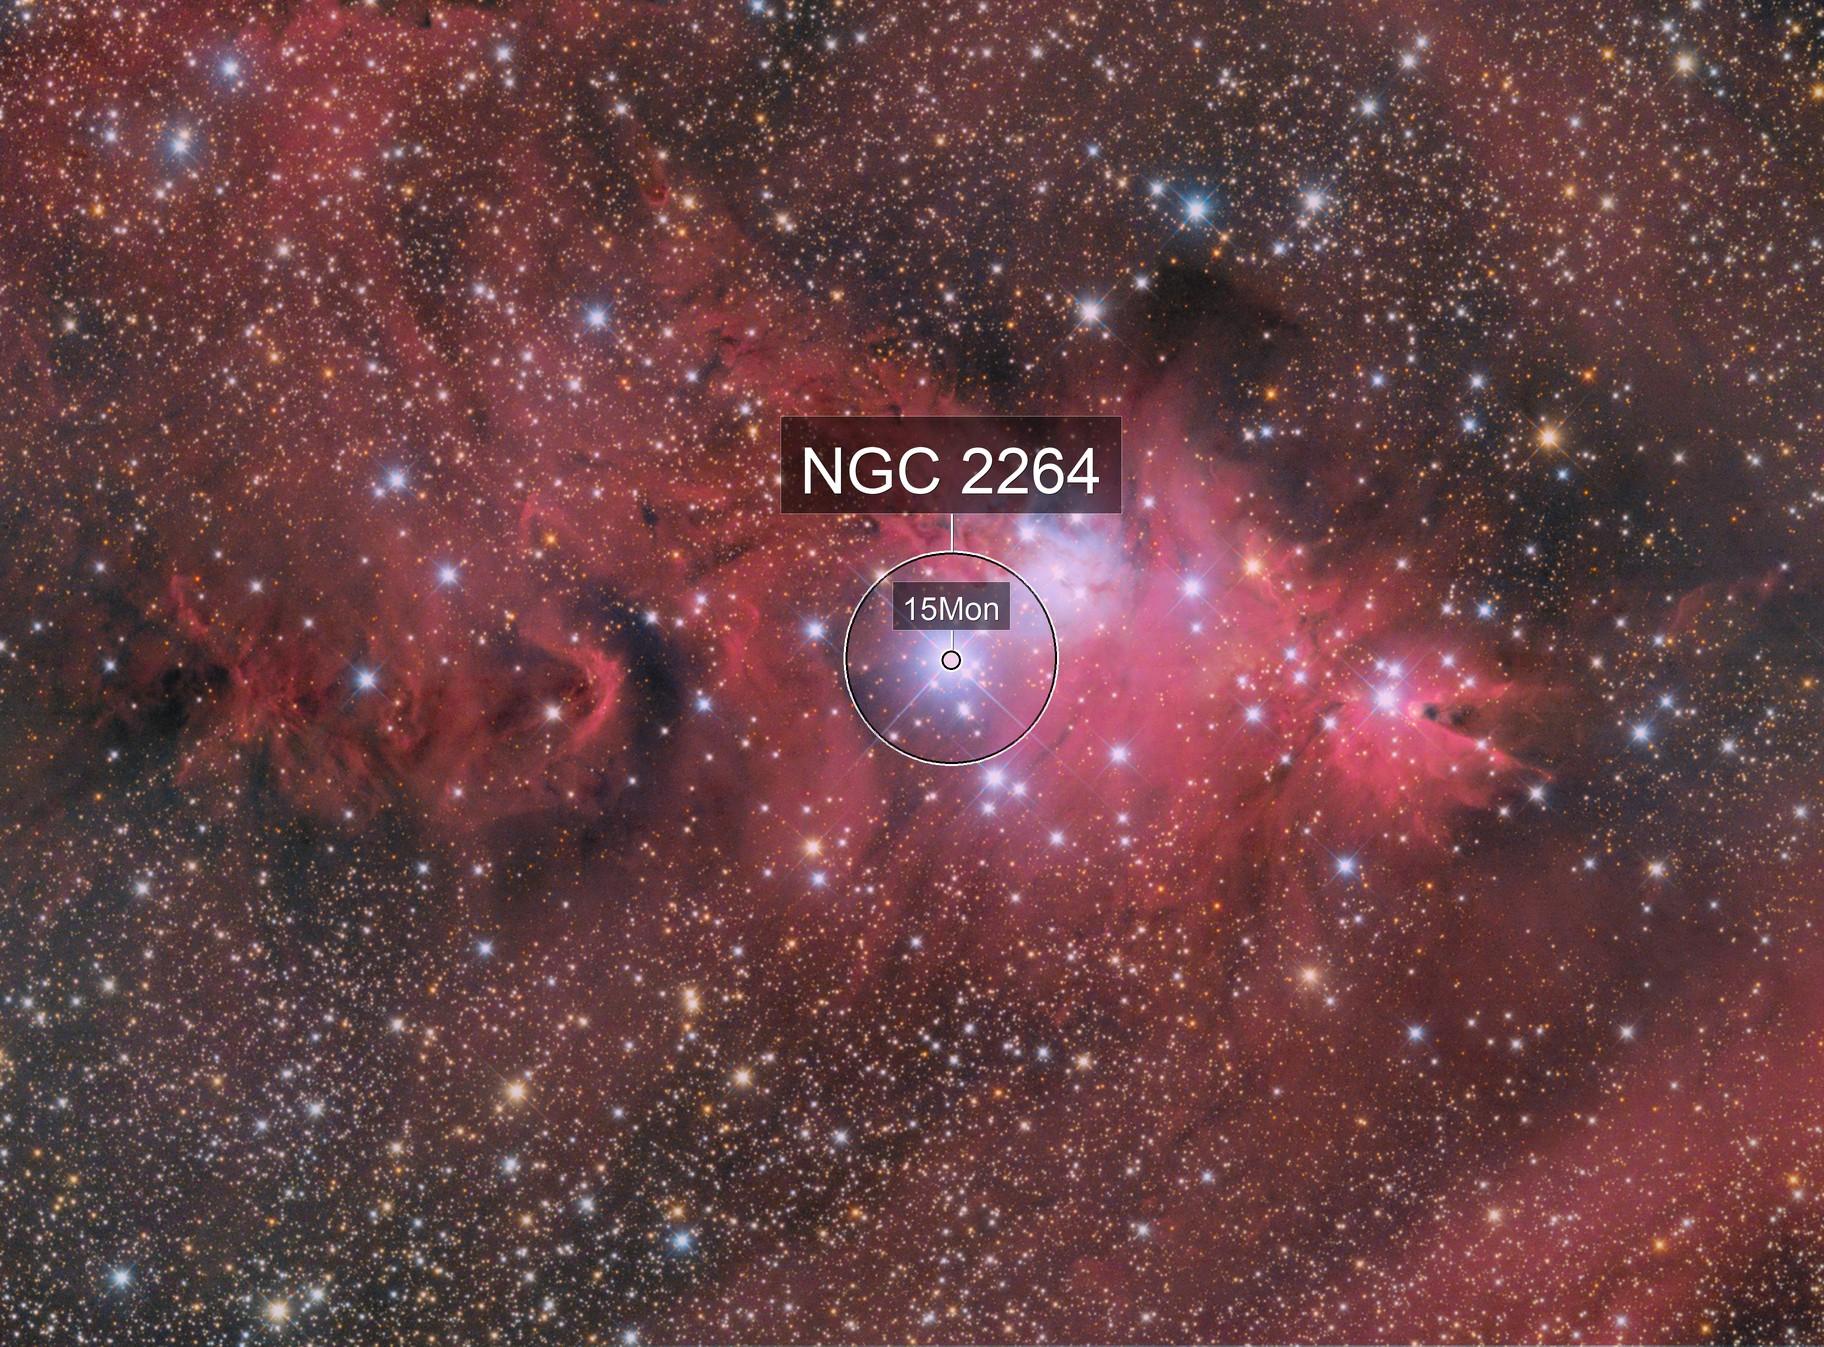 NGC 2264 and Cone Nebula LRGBHa final version